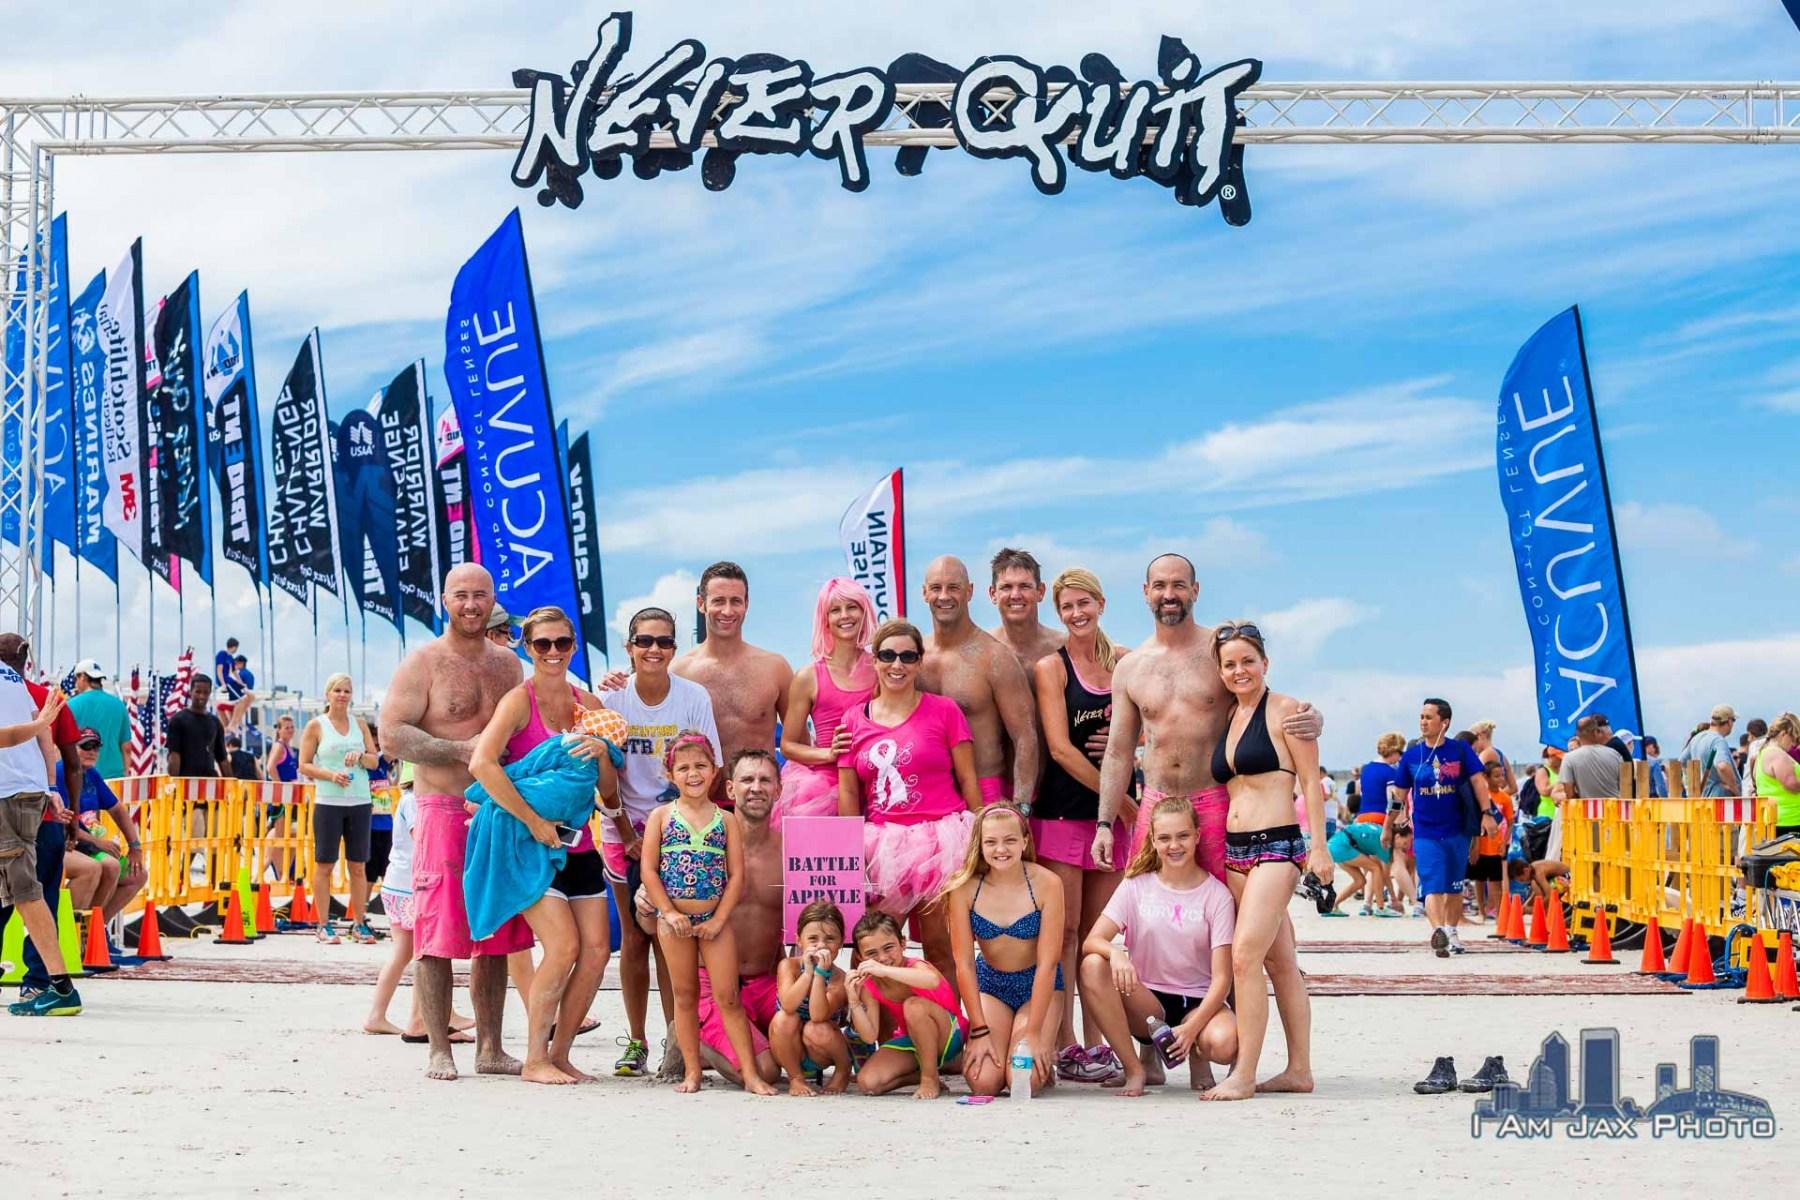 Nevery Quit 2014 - Jax Beach, FL